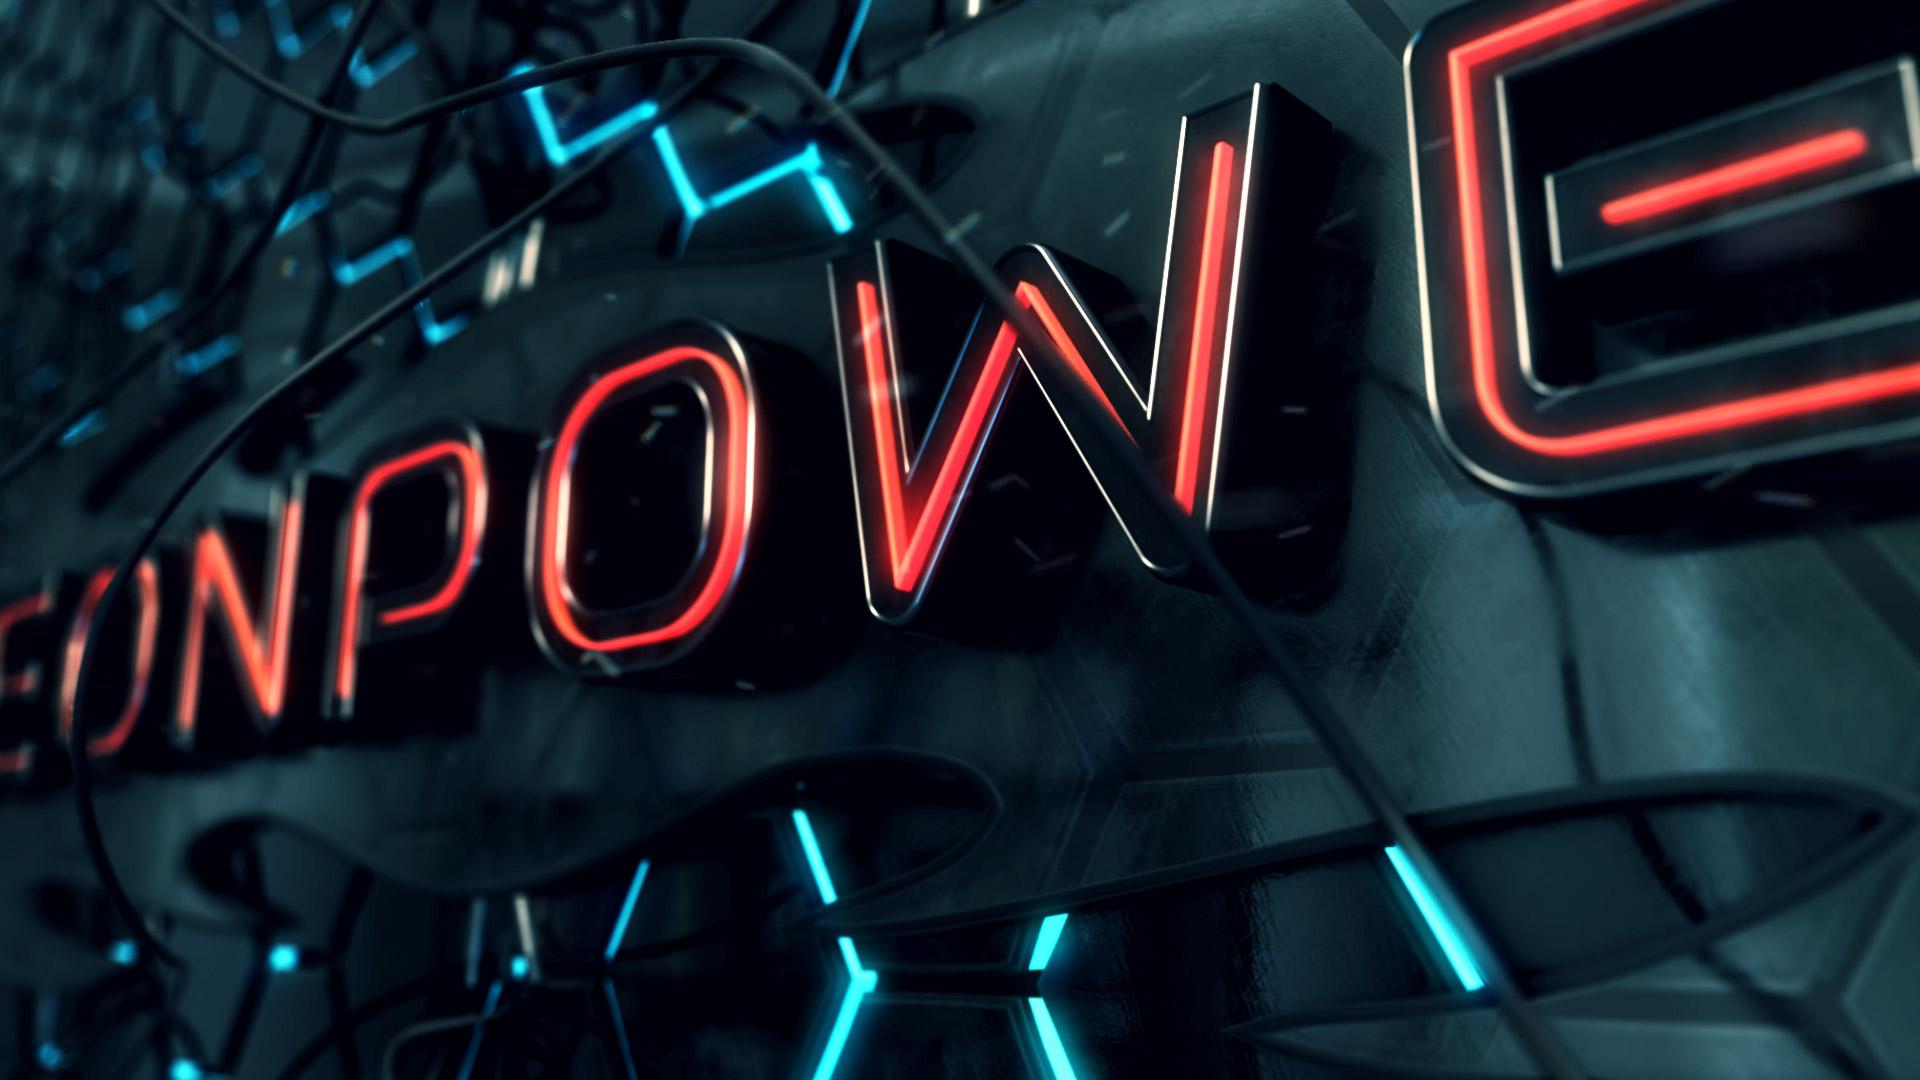 Neon Power Logo Opener - 4